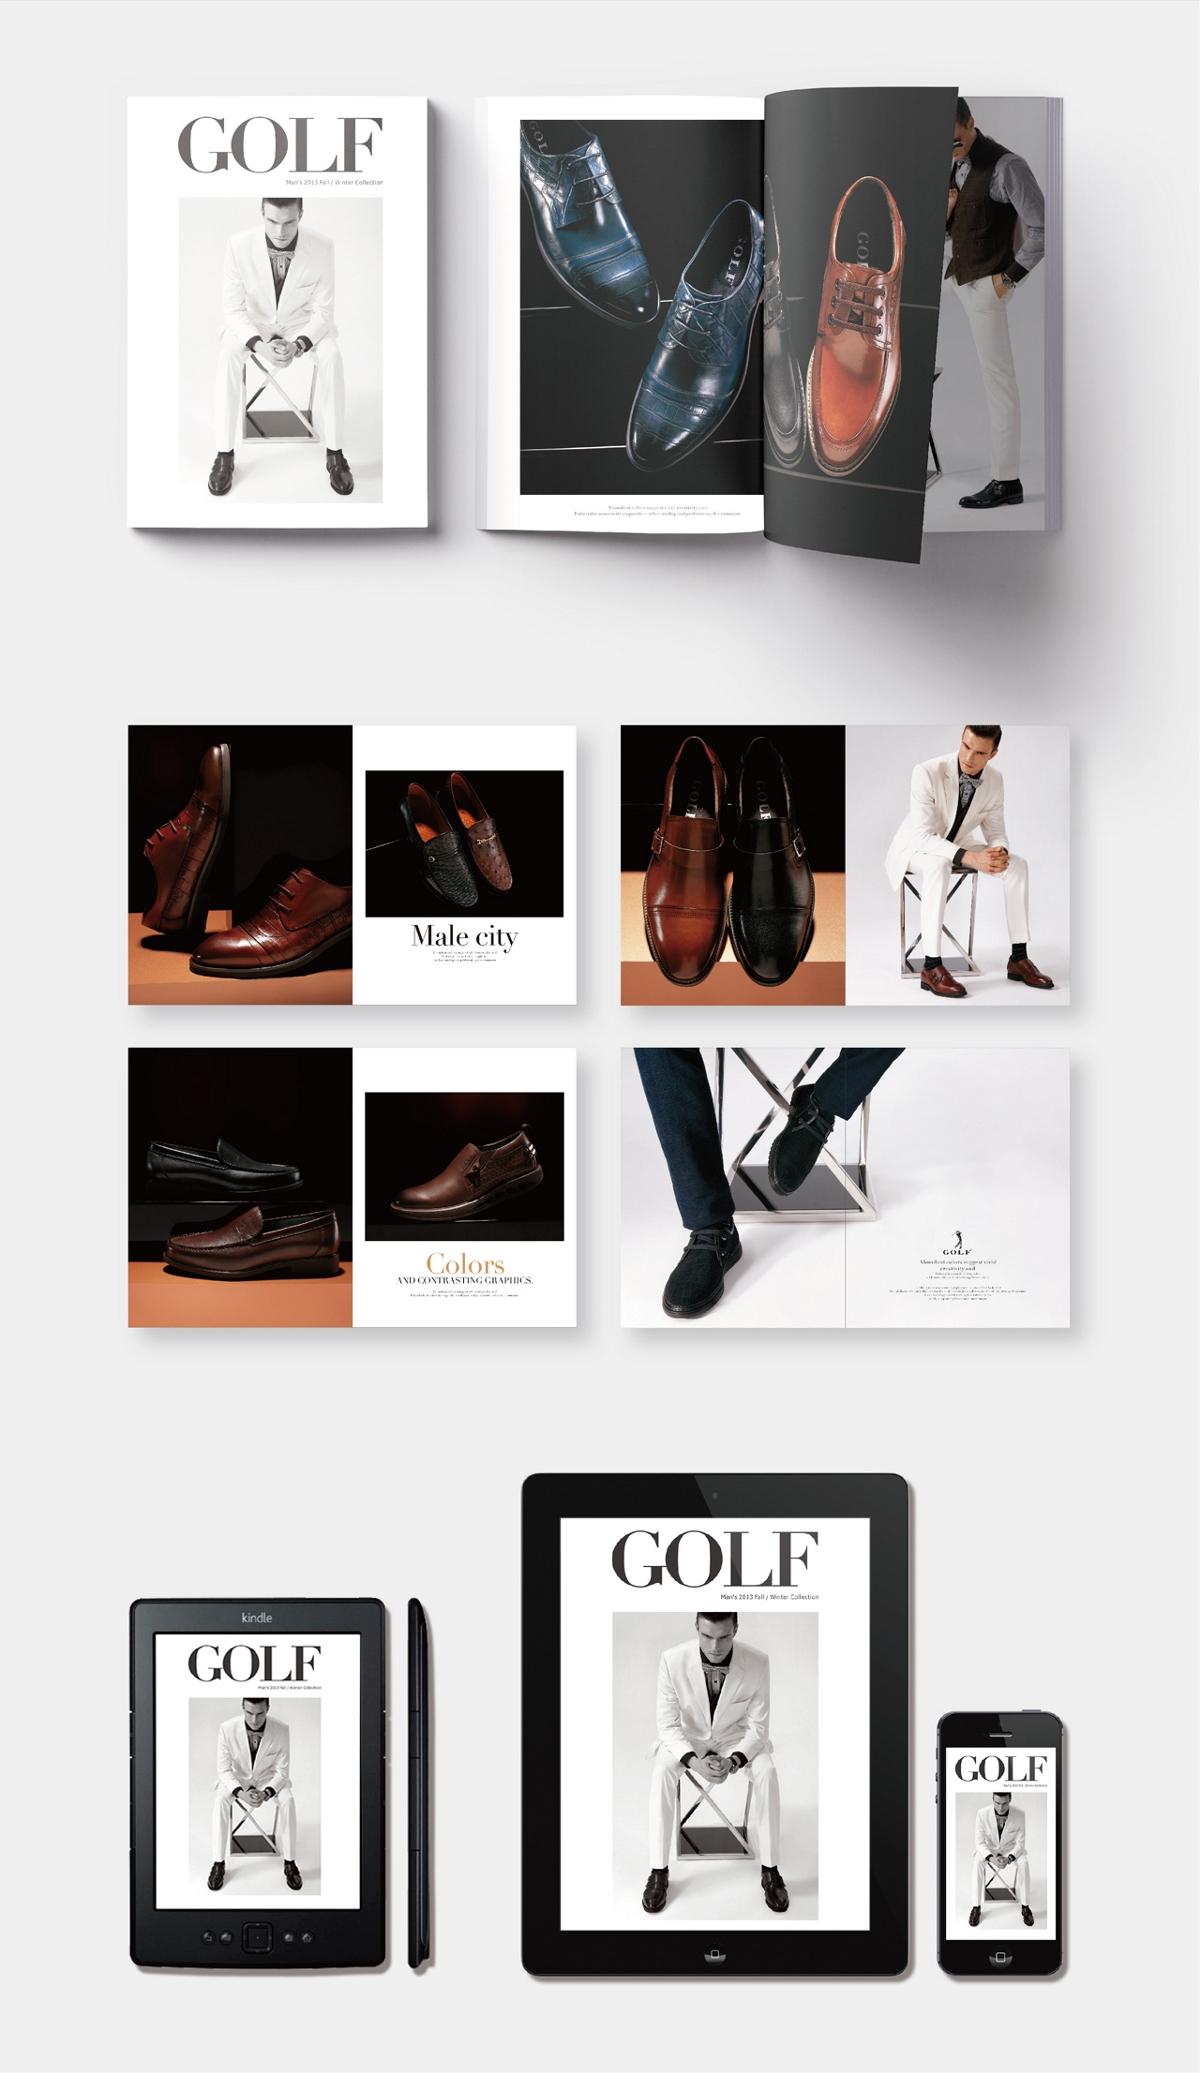 GOLF高夫 | 婴幼儿哺喂品牌 · 男鞋